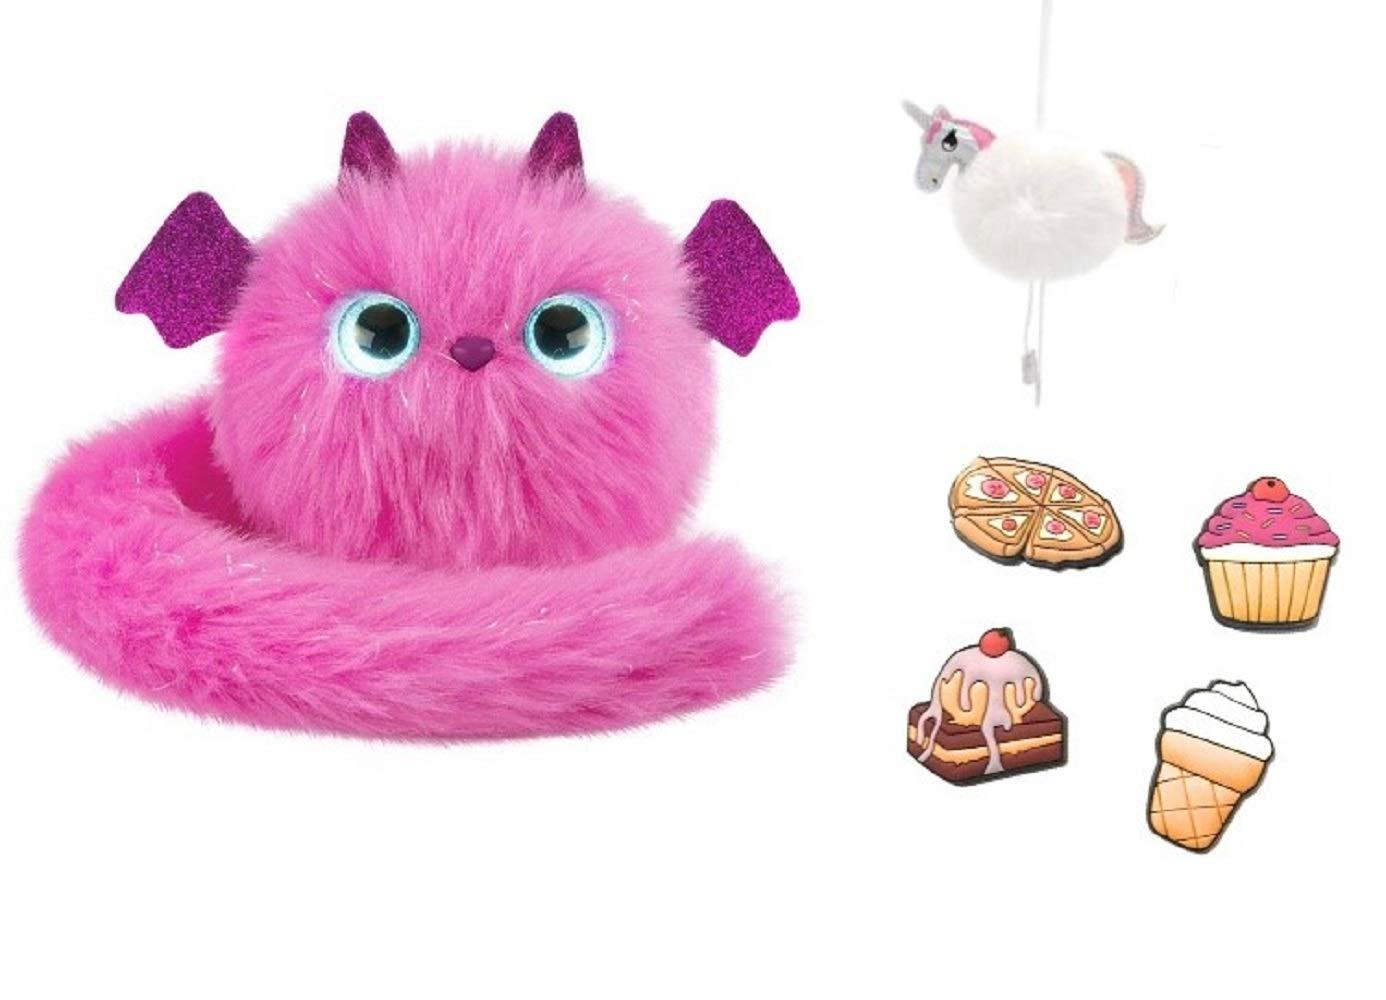 POMSIES Plush Interactive Toy Dragon •ZOEY• New!